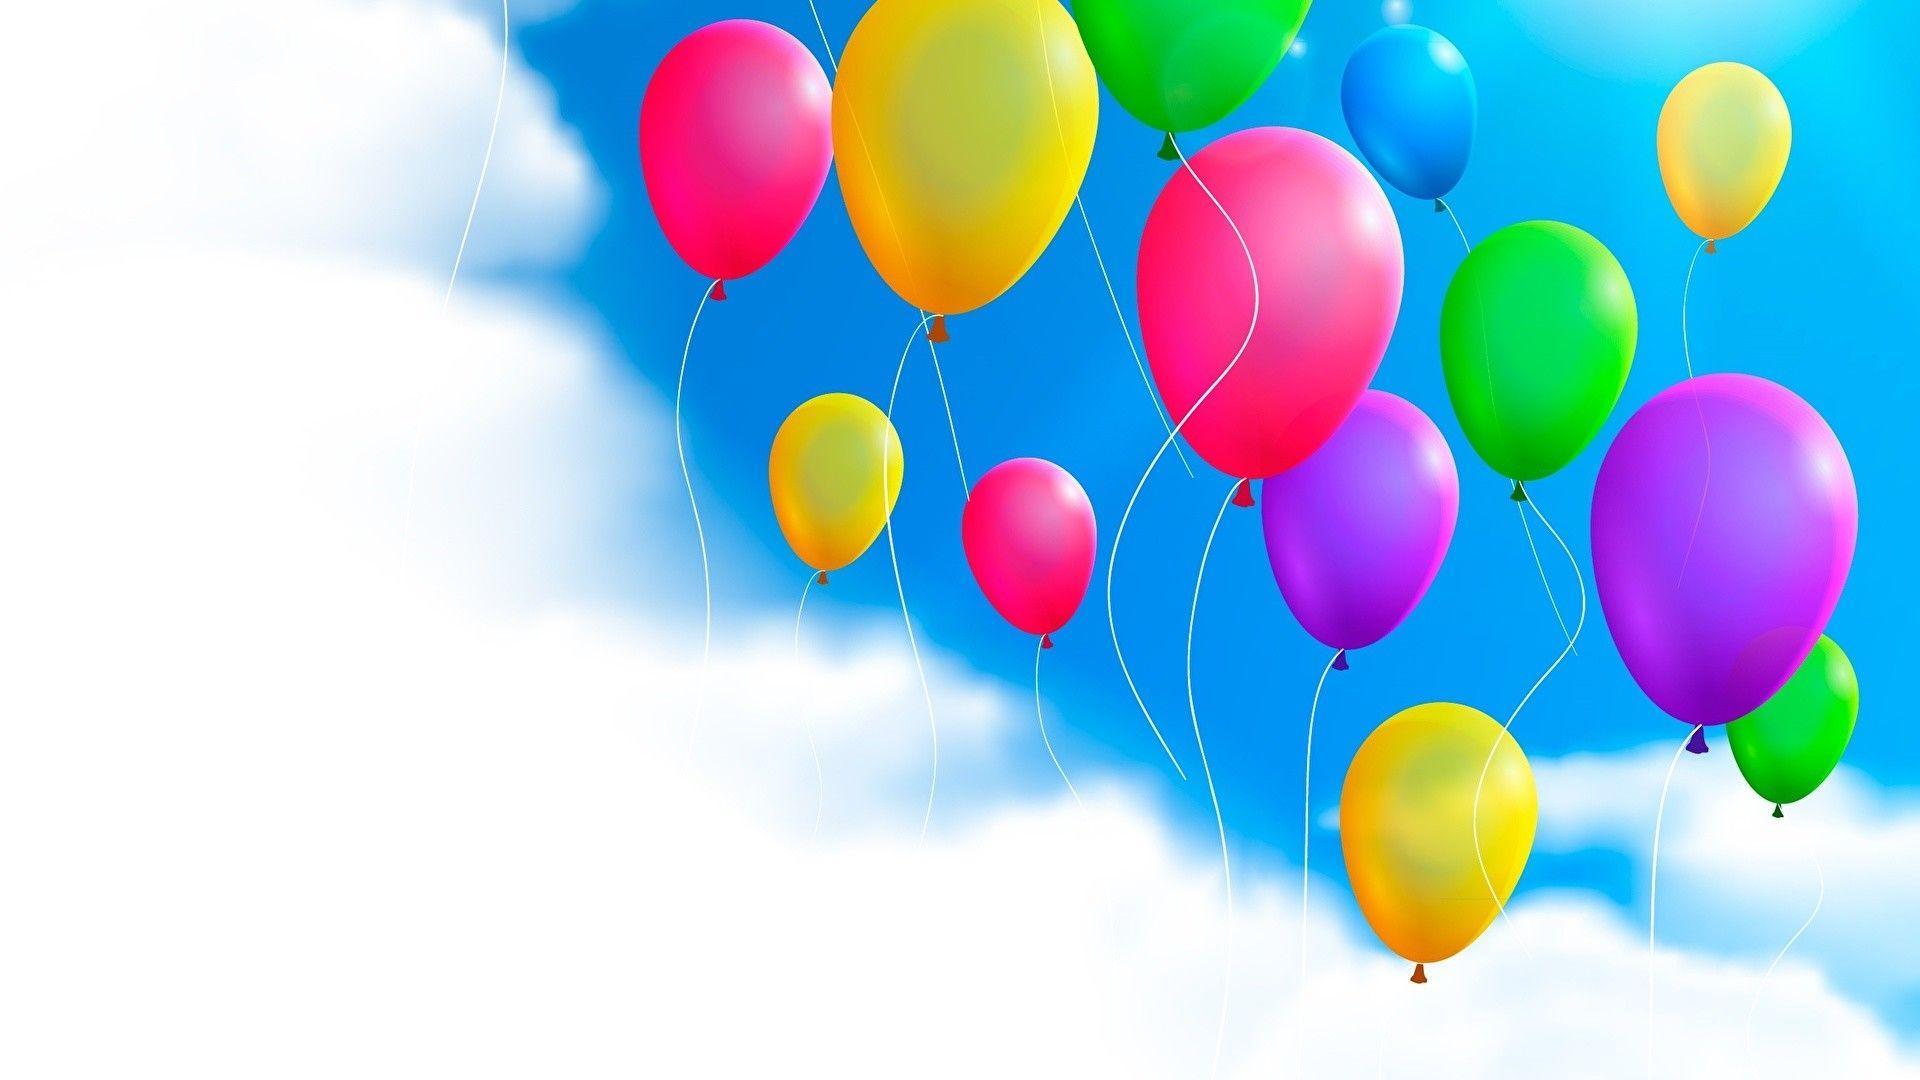 1920x1080 Hintergrundbilder Luftballon Himmel Wolke 1920x1080 Luftballons Wallpaper Fur Desktop Kostenlose Ausmalbilder